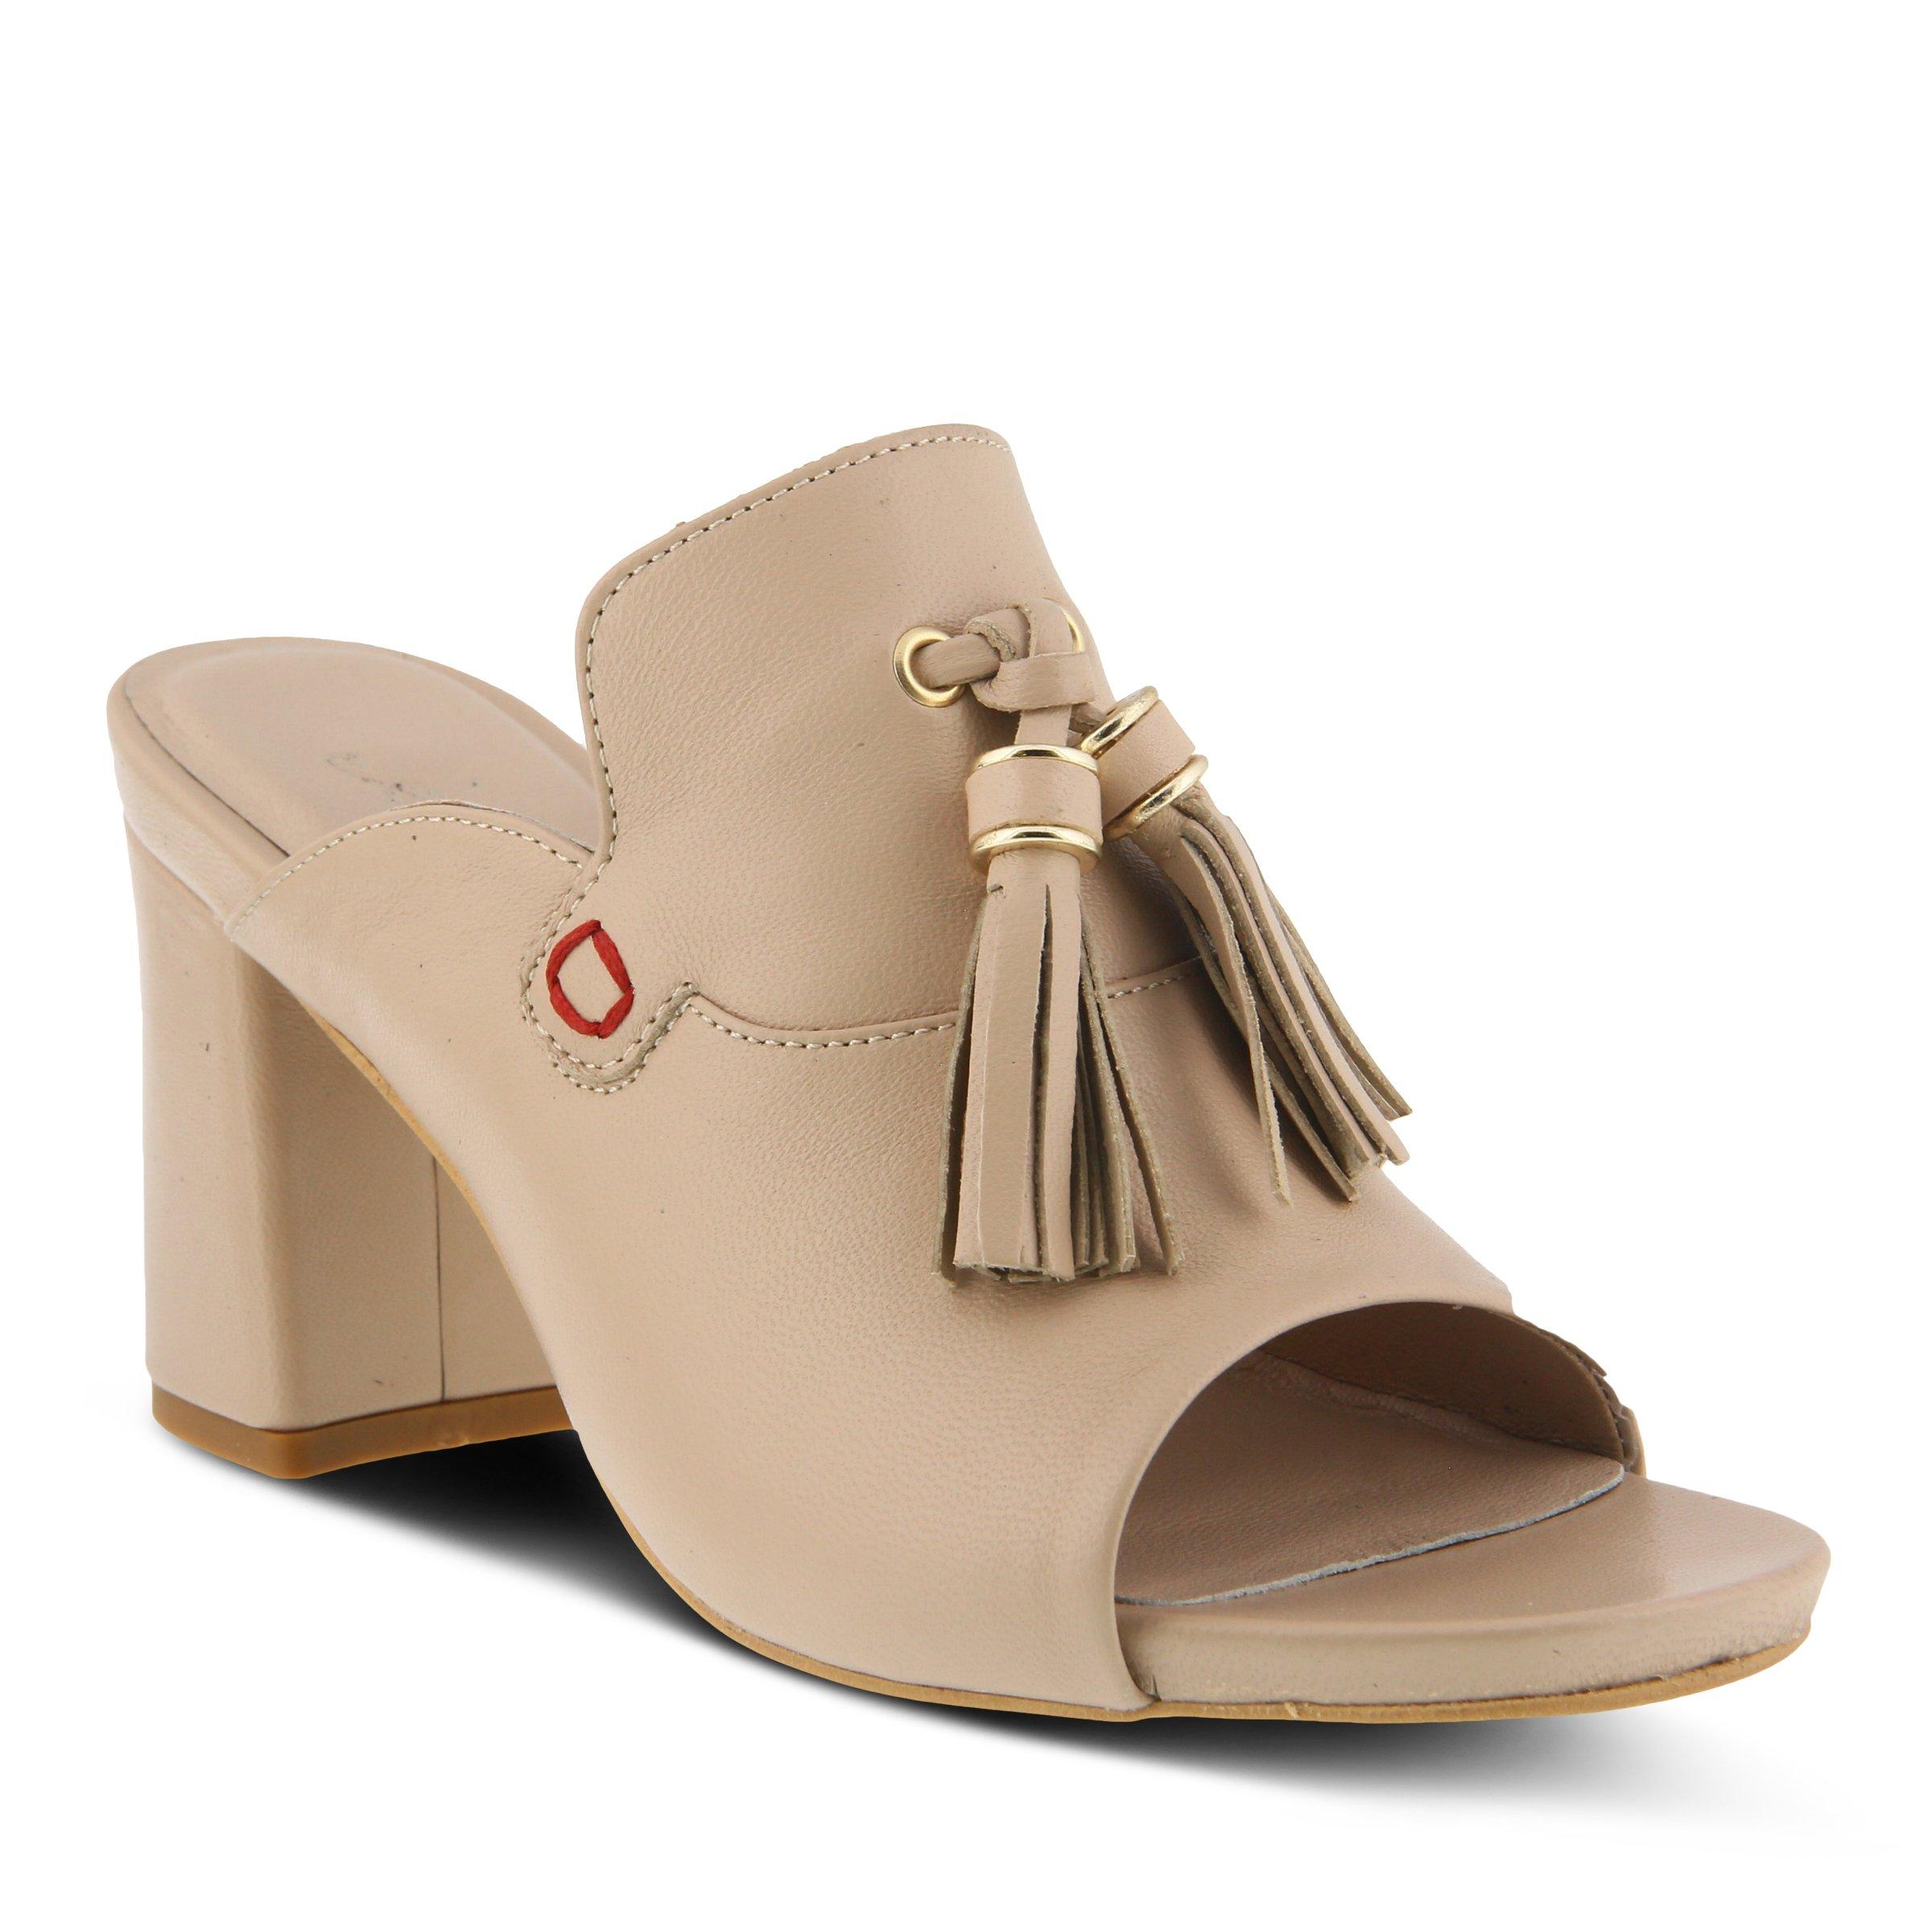 Azura Women's Style Brunilda Beige EURO Size 36 Leather Slide Sandal